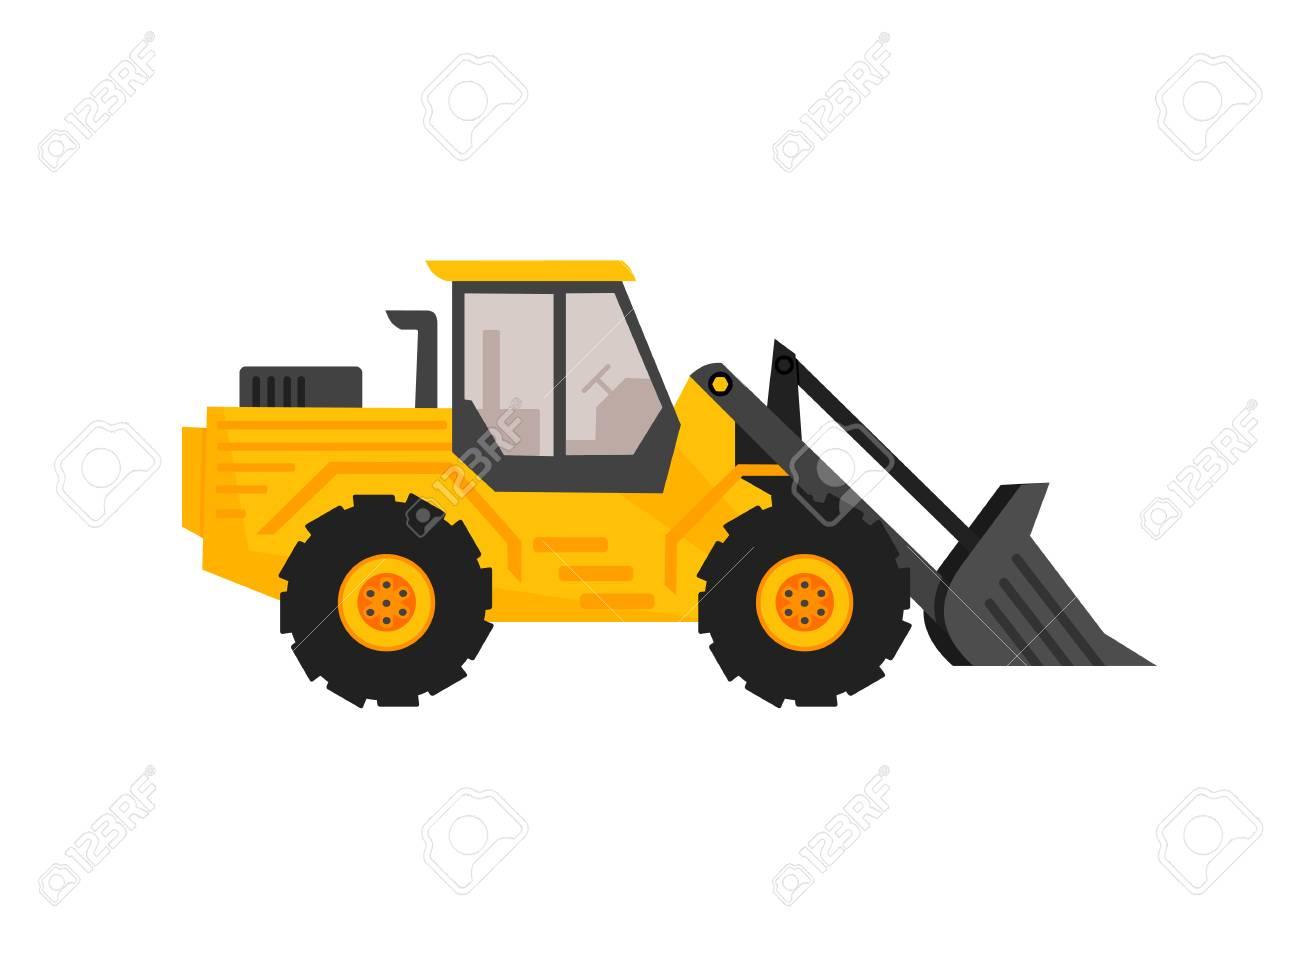 front end loader, excavator, front load washing machine, washing machine, backhoe, dump truck, tractor, front loader washing machine - 90713993